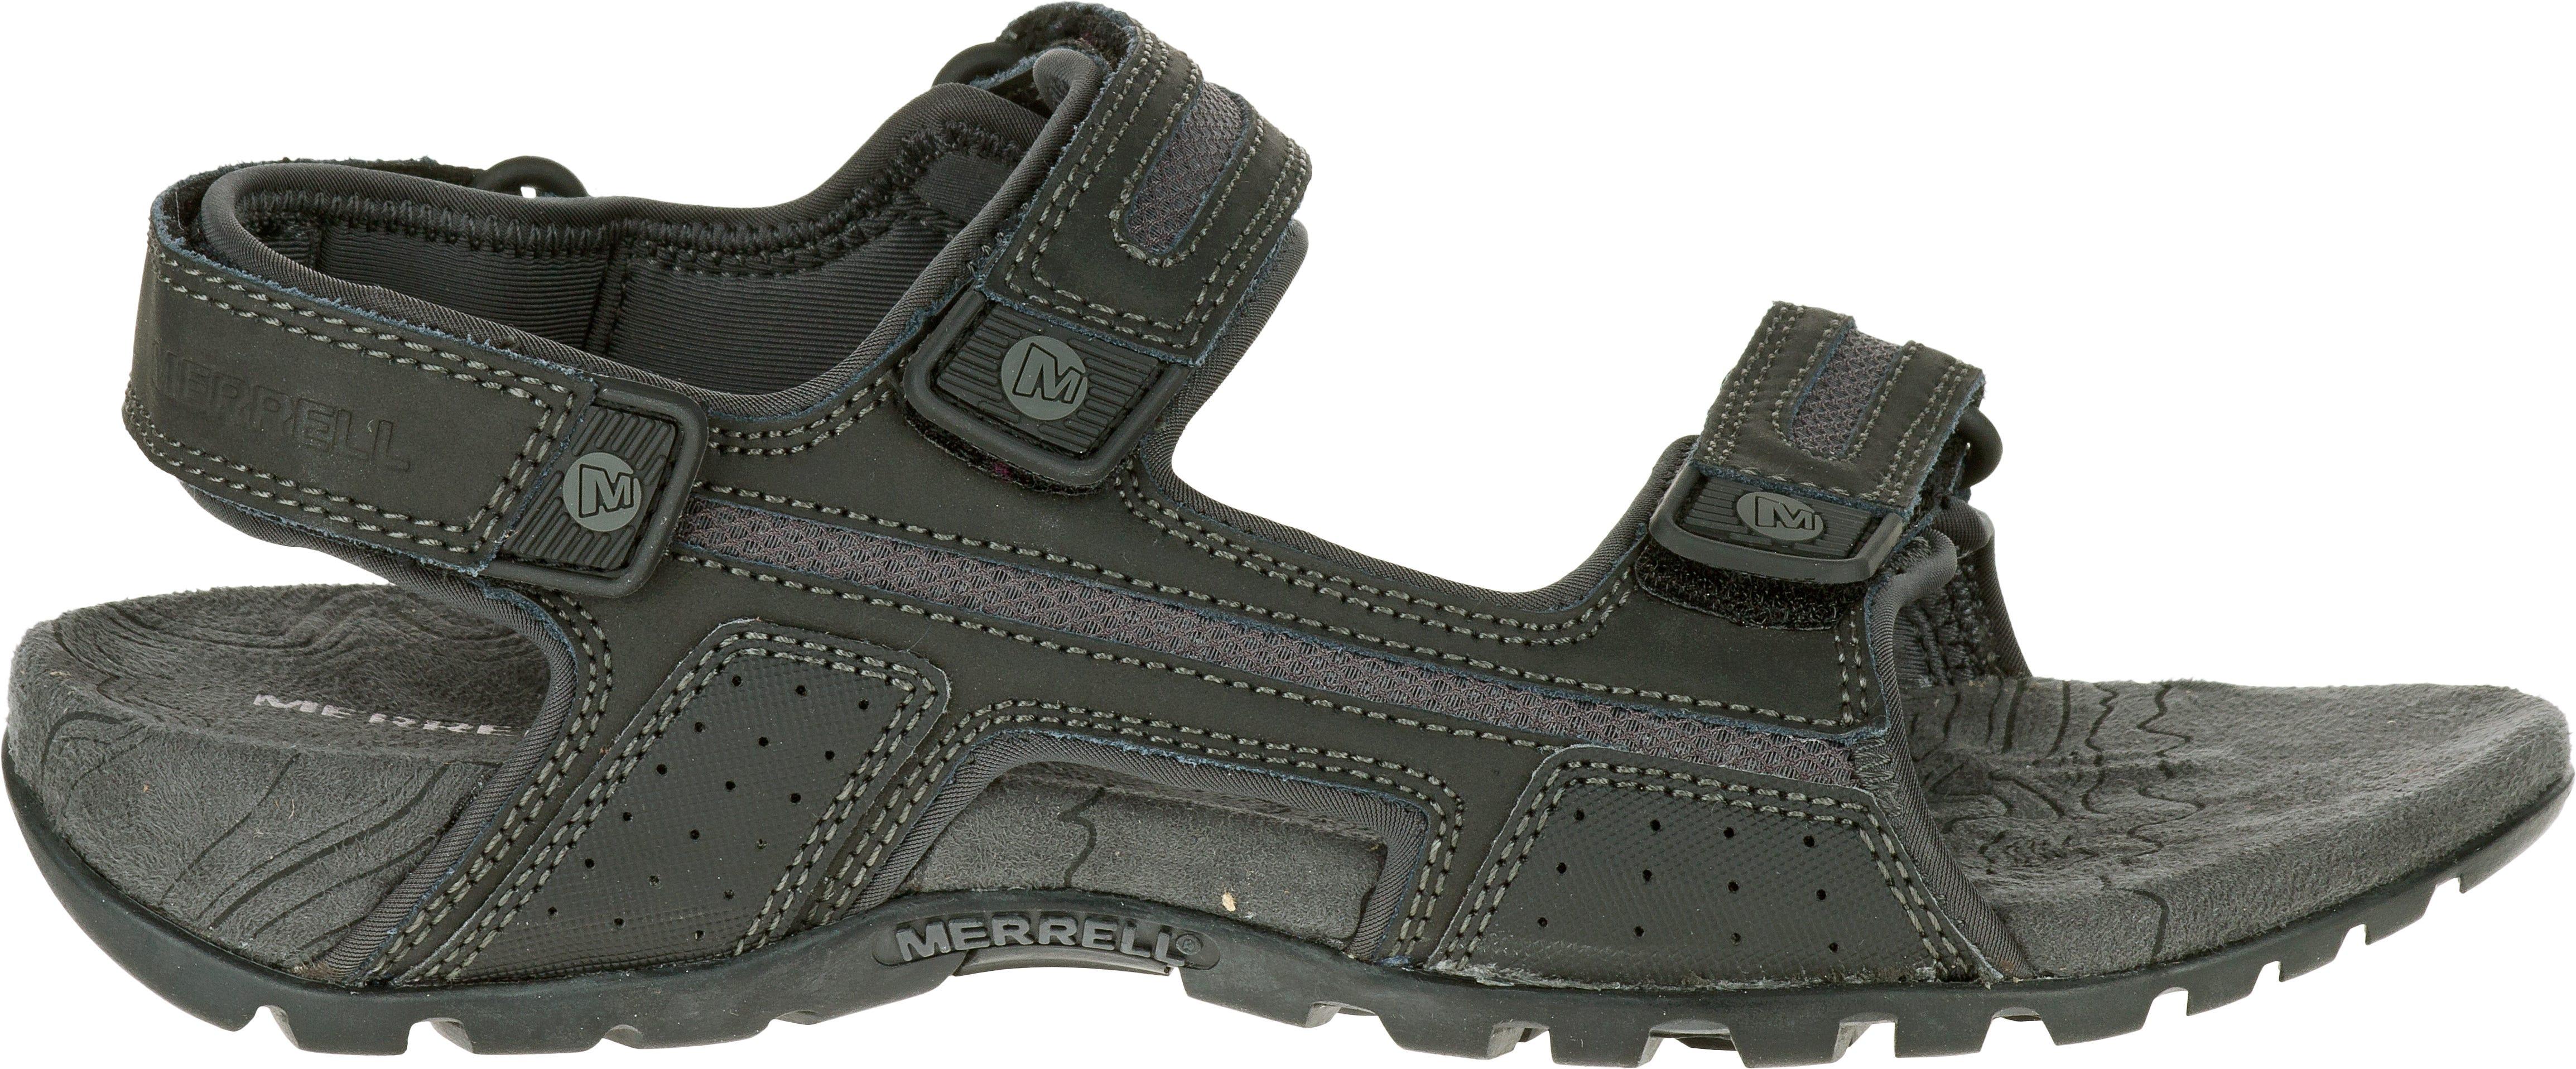 MERRELL Sandspur Oak J276754C Outdoor Hiking Sport Sandals Mens New All Size New